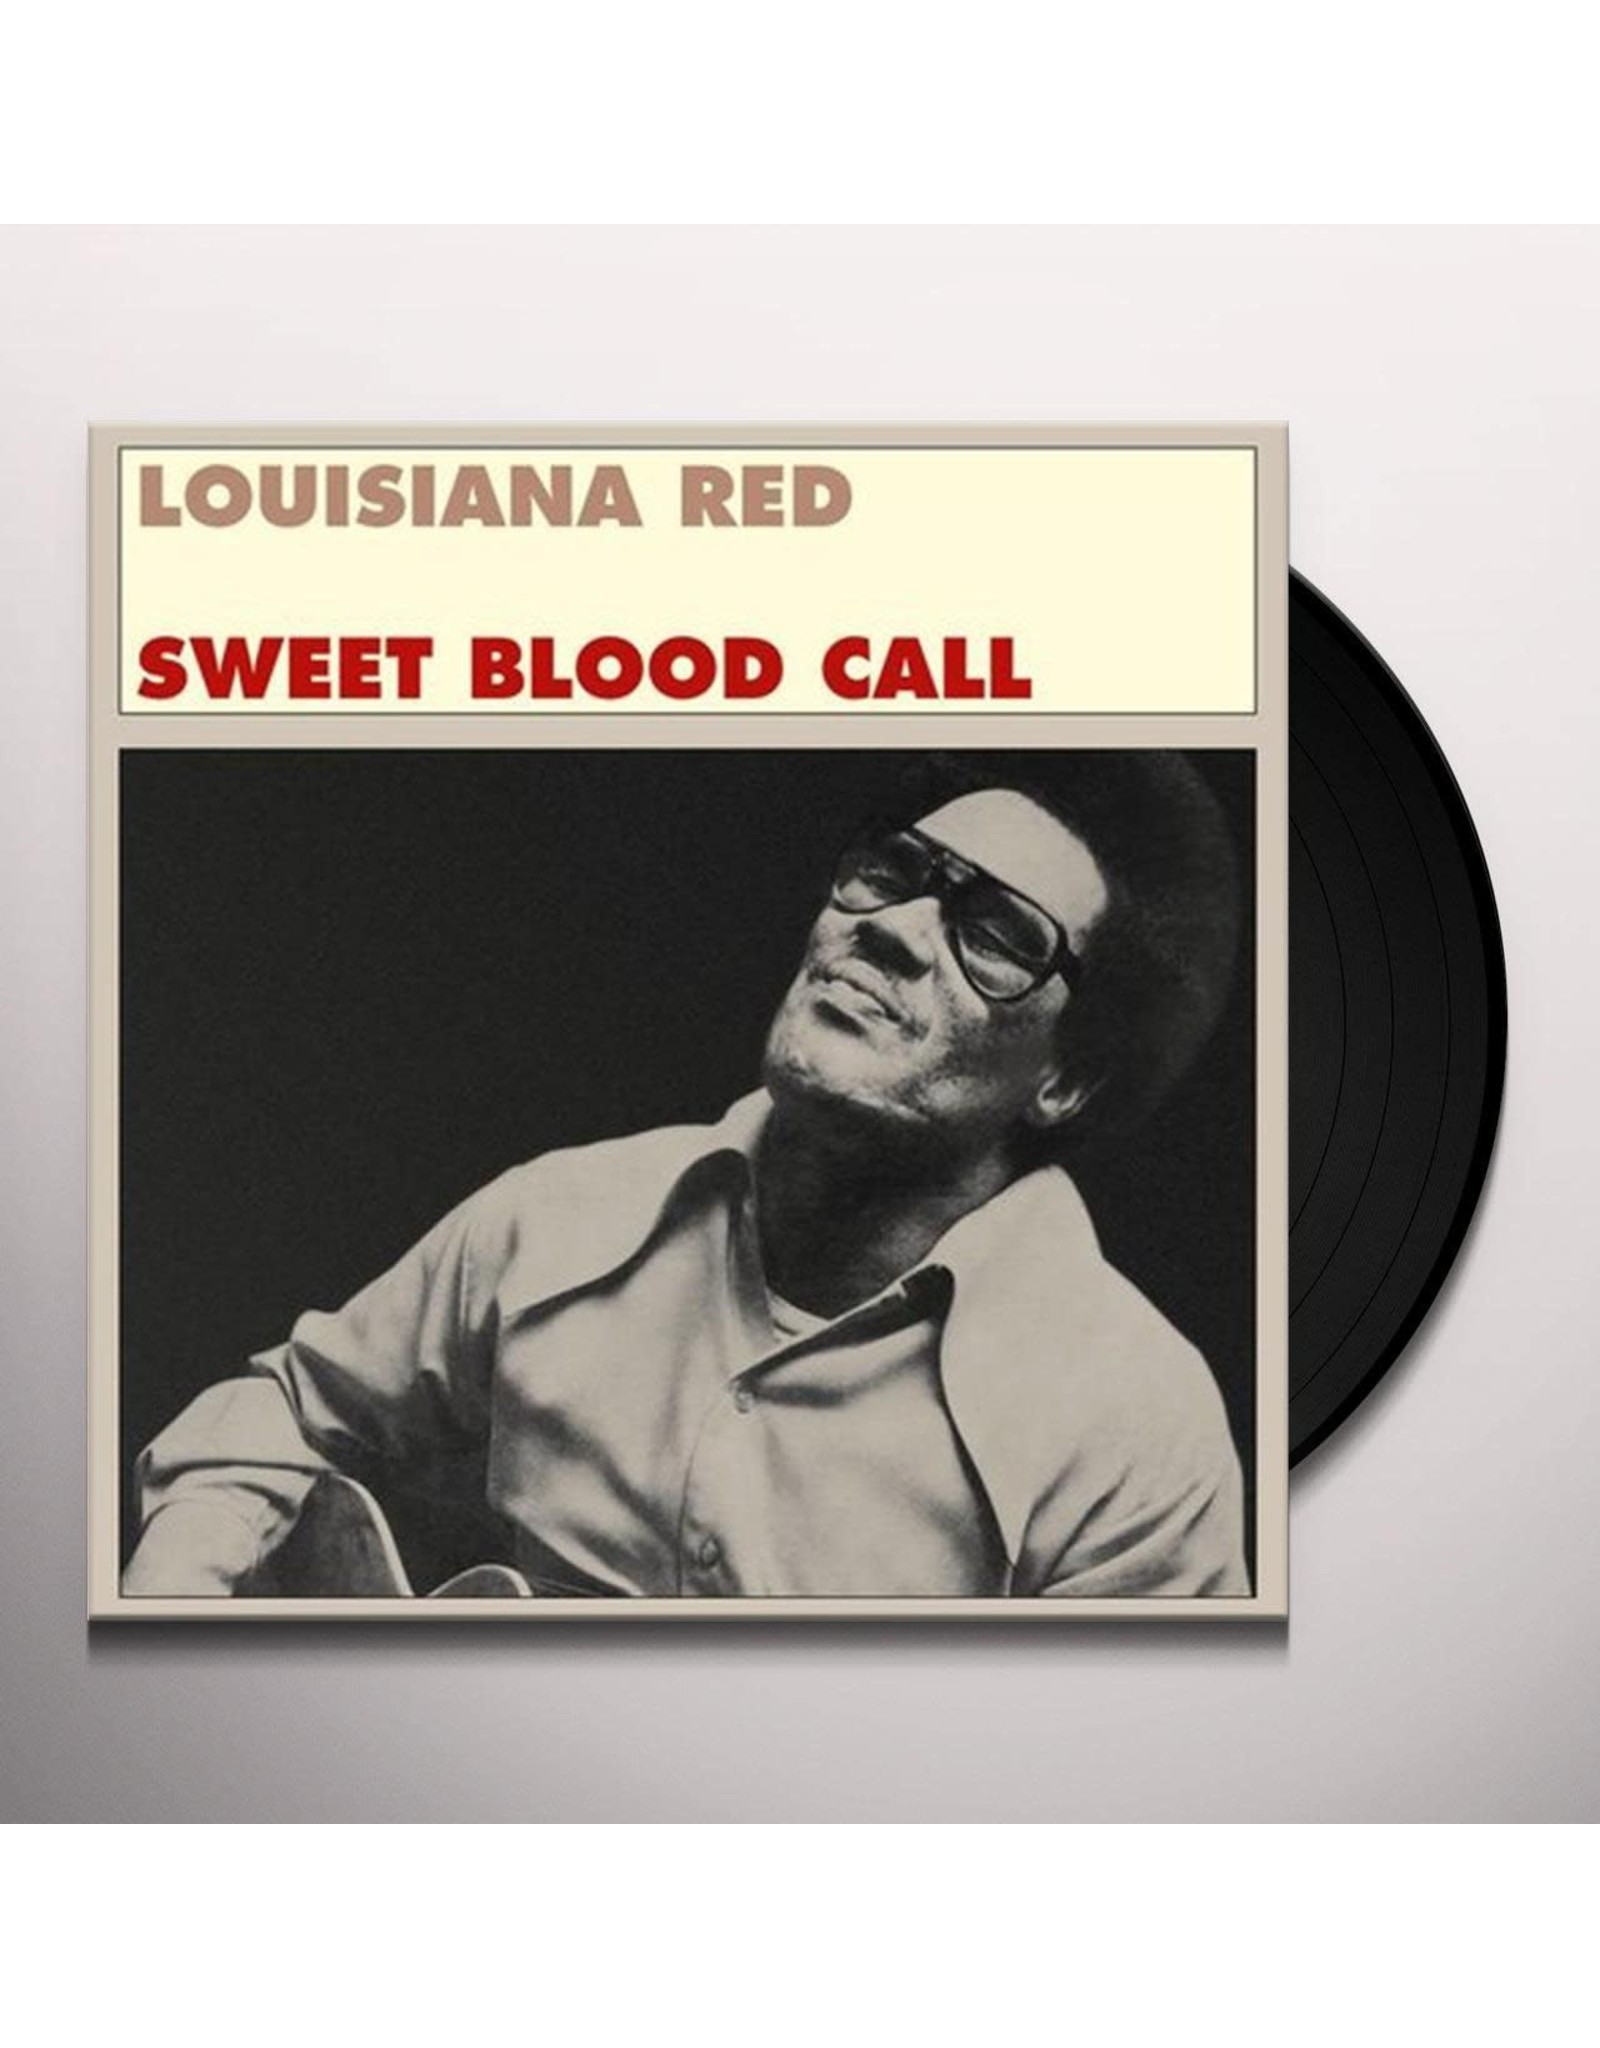 Louisiana Red - Sweet Blood Call LP